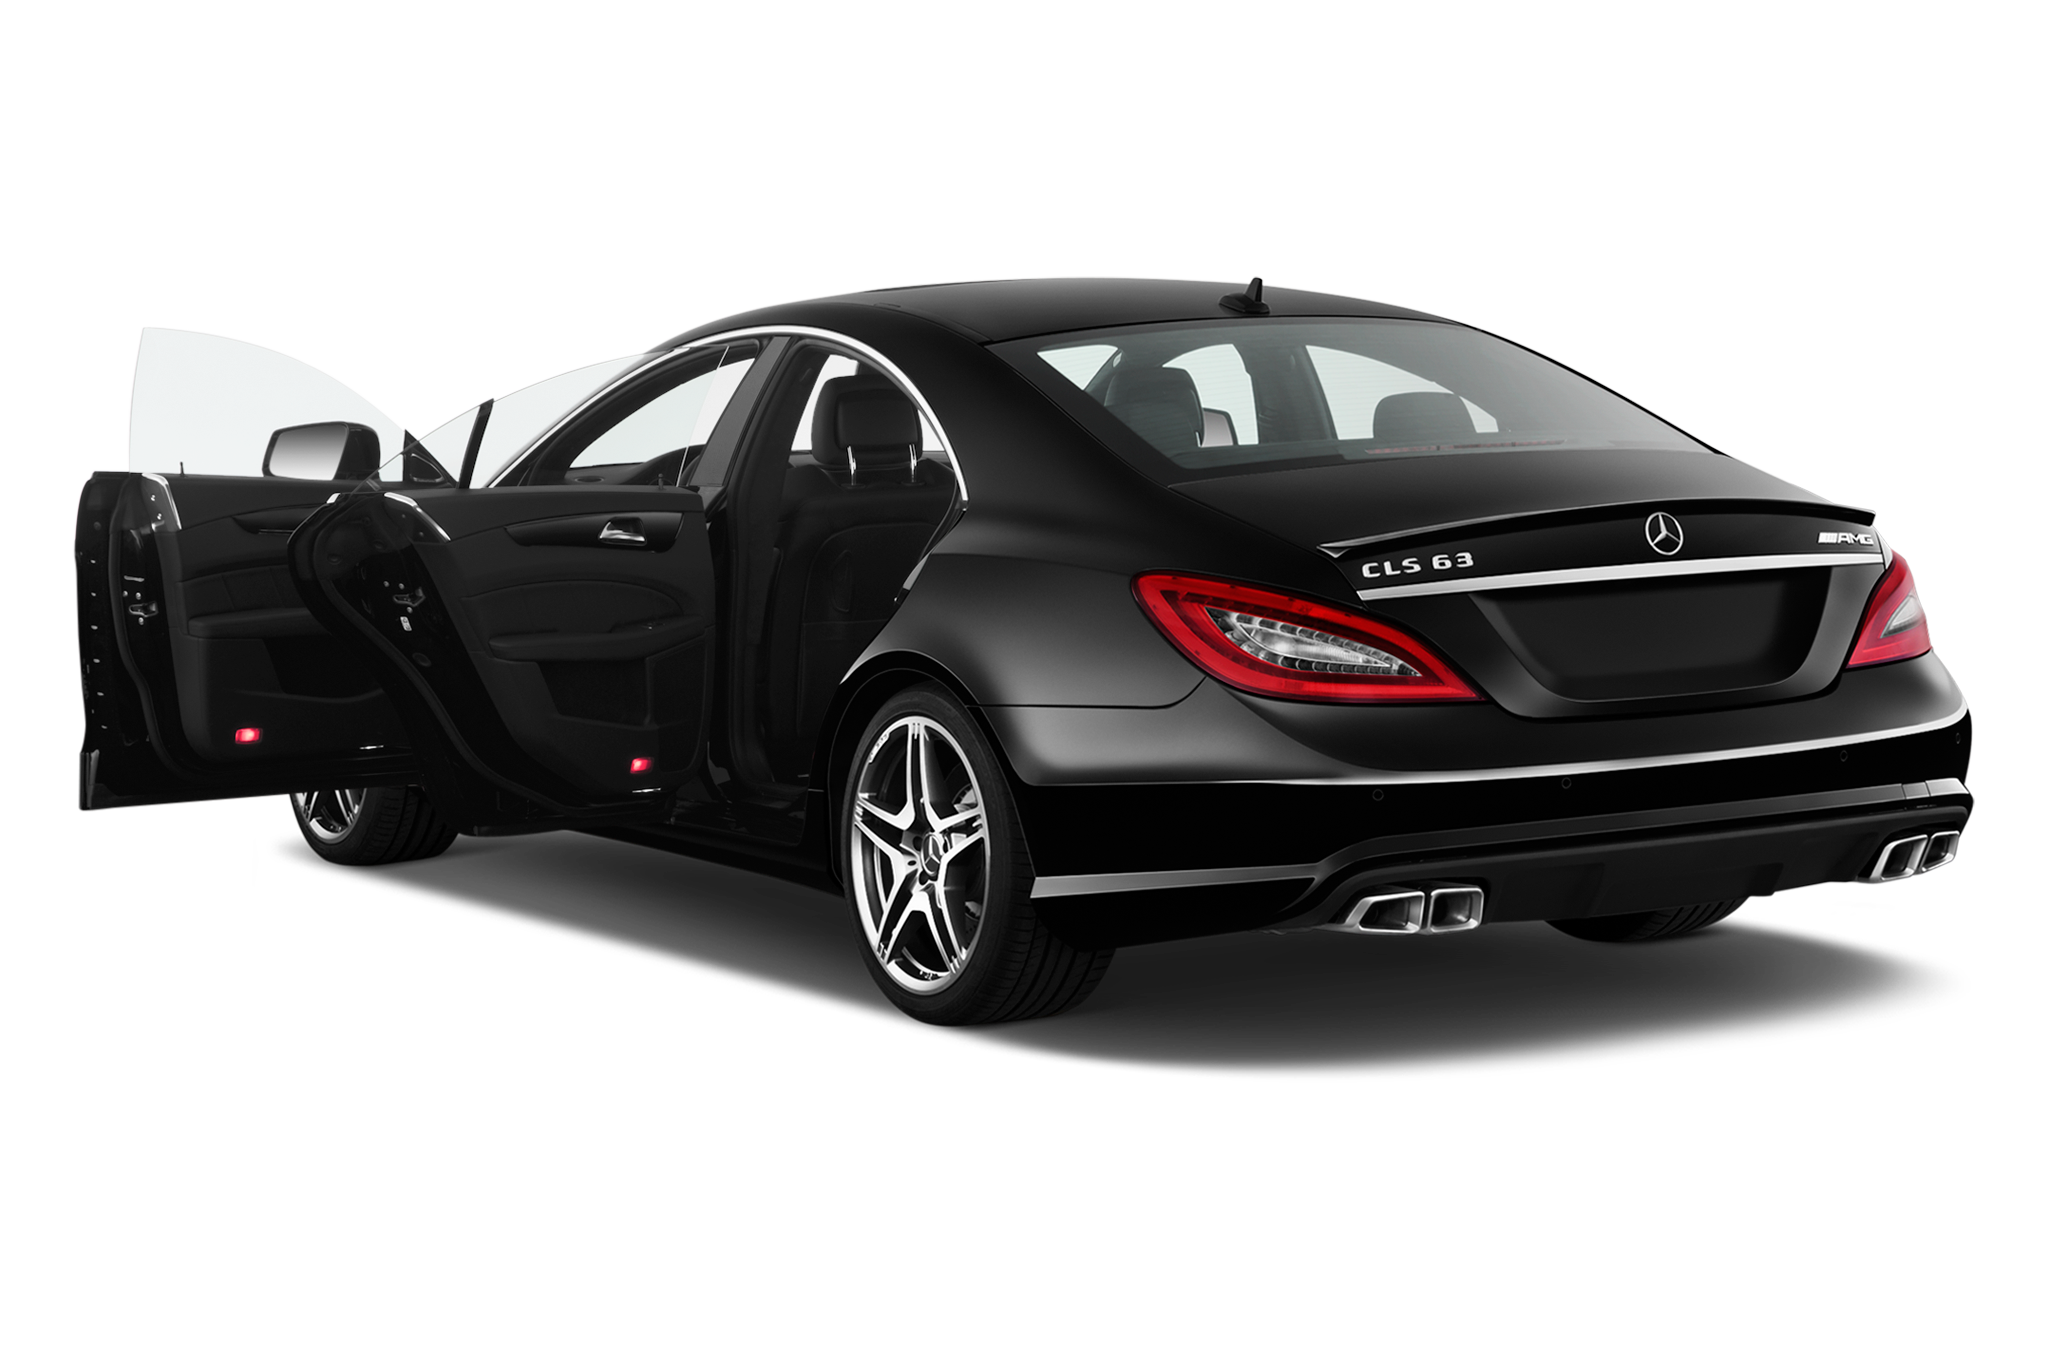 Mercedes-Benz CLS-klasse AMG II (W218) Restyling 2014 - now Station wagon 5 door #3